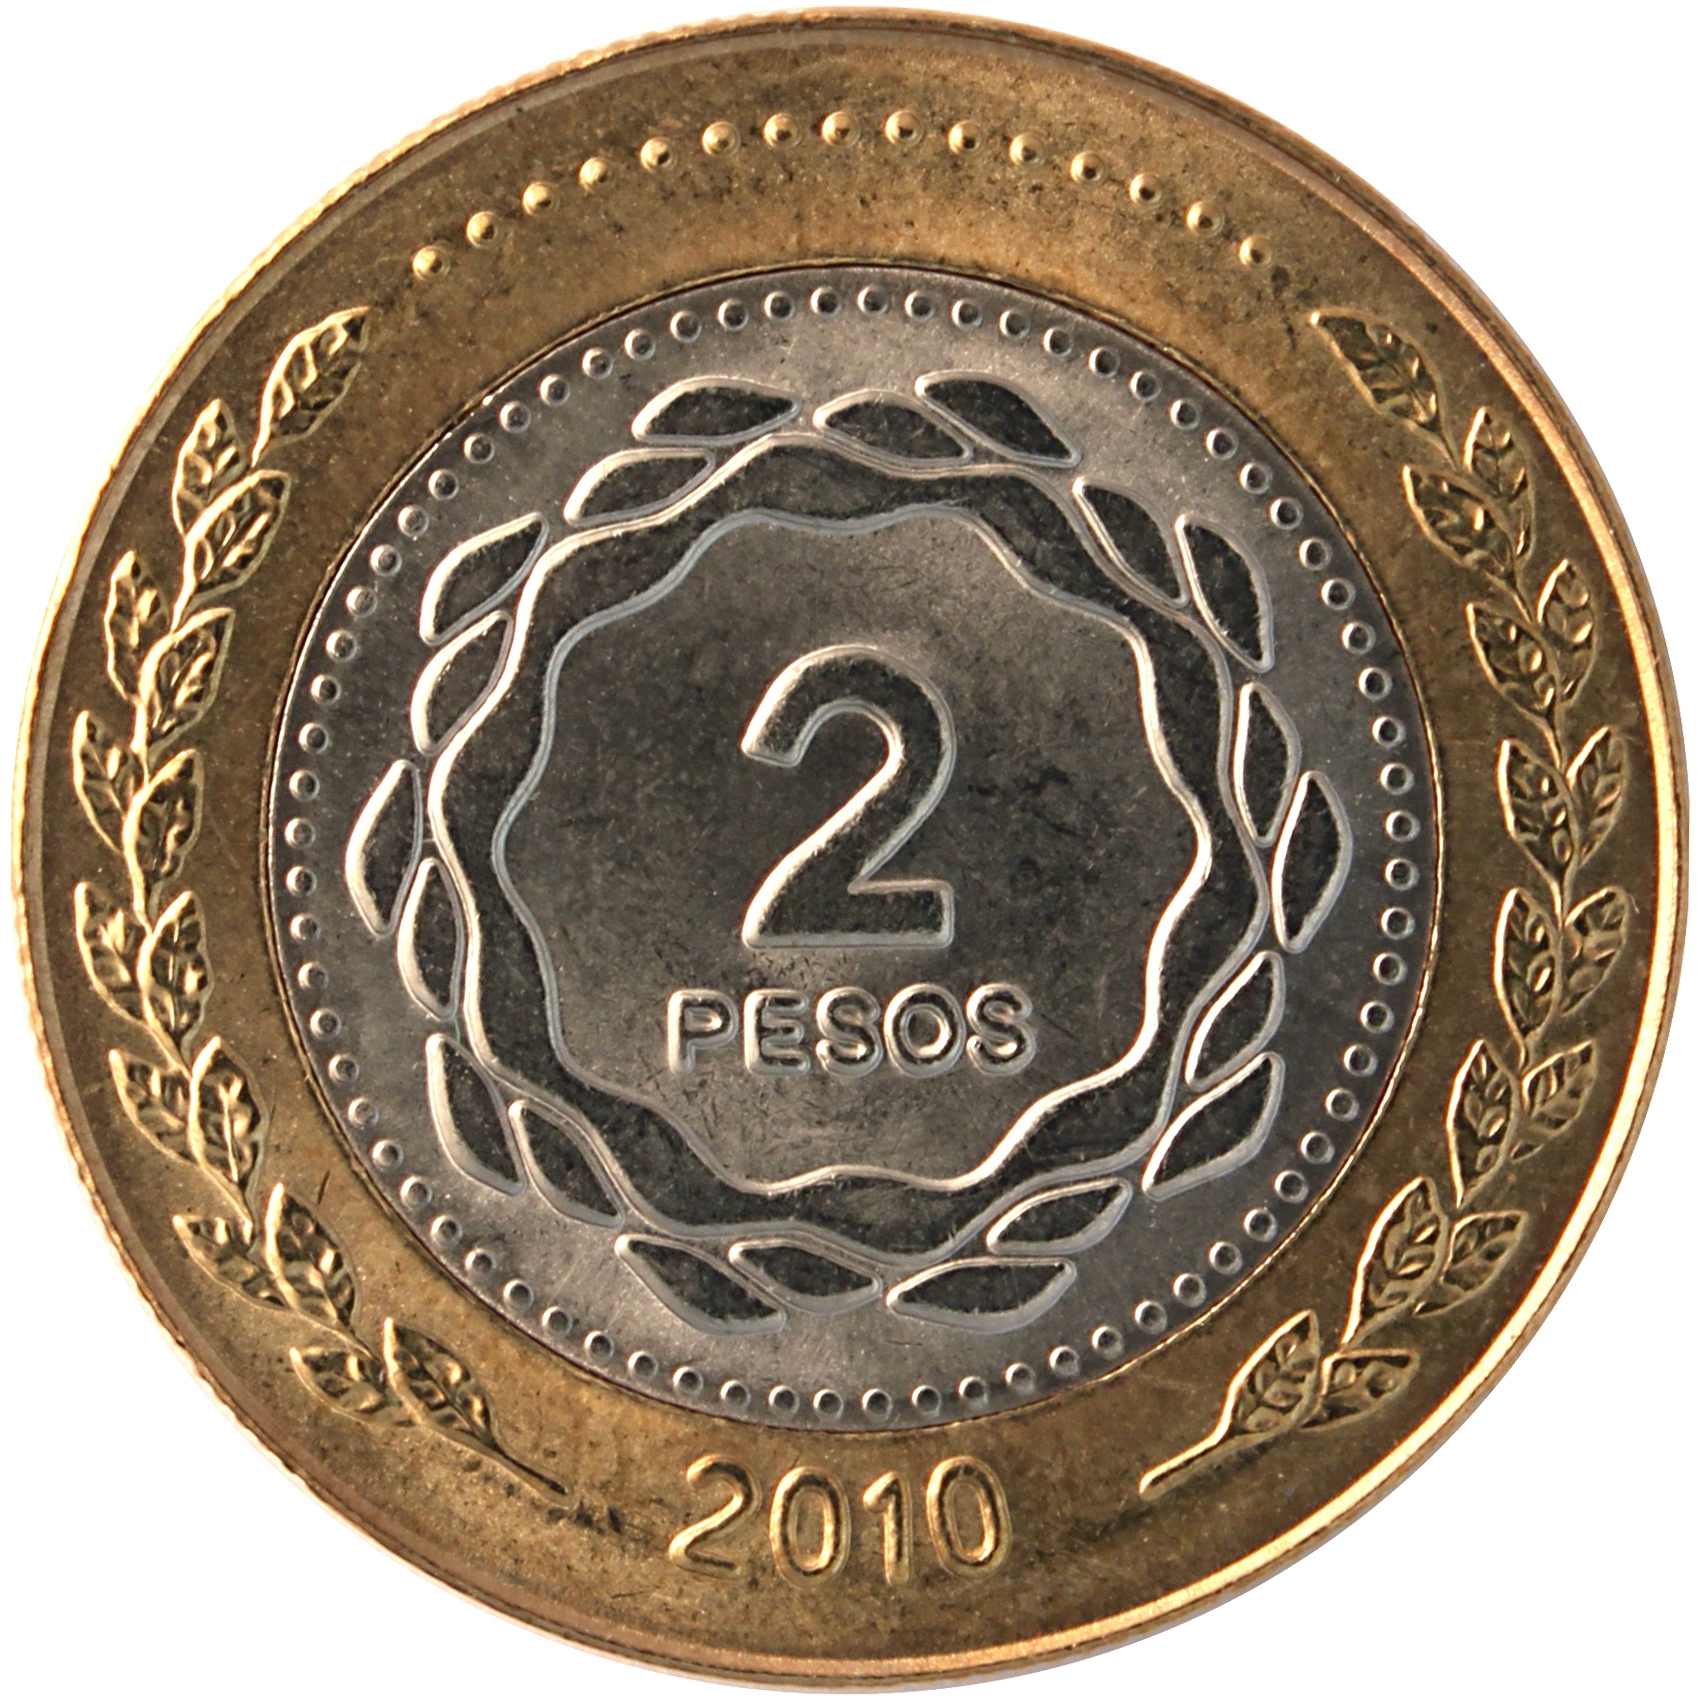 Resultado de imagen para moneda dos pesos